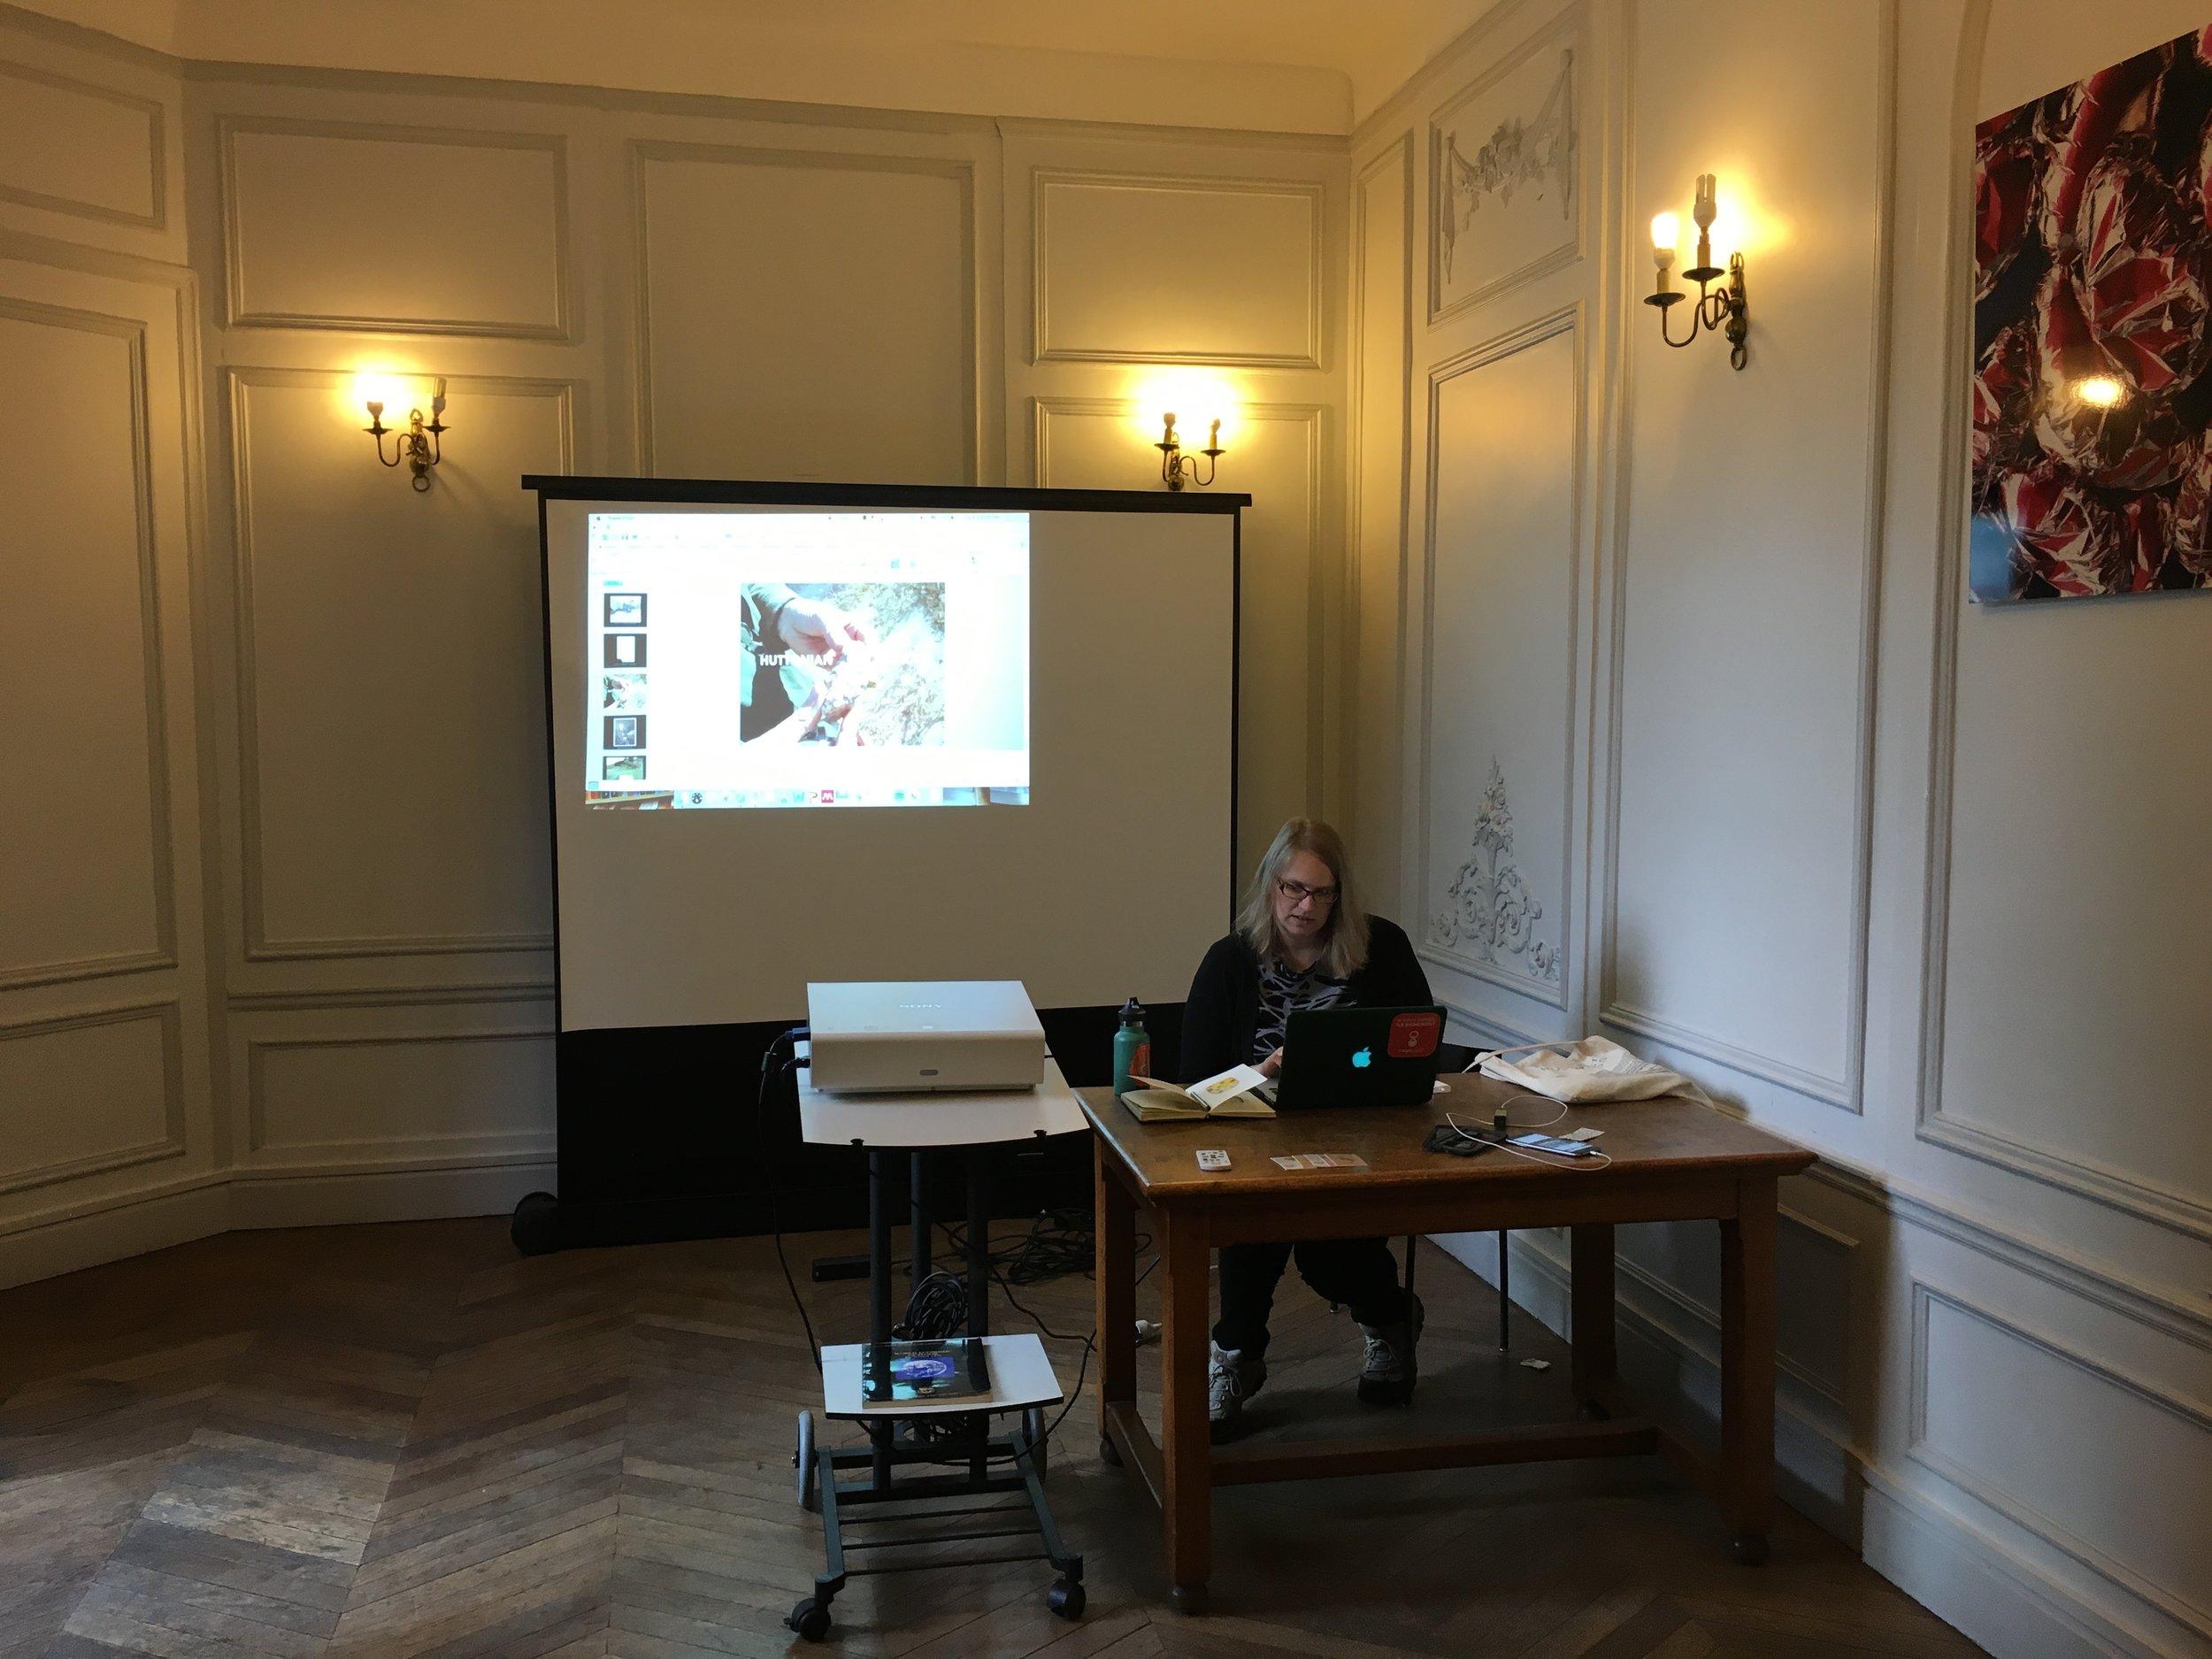 paris_presentation.jpg